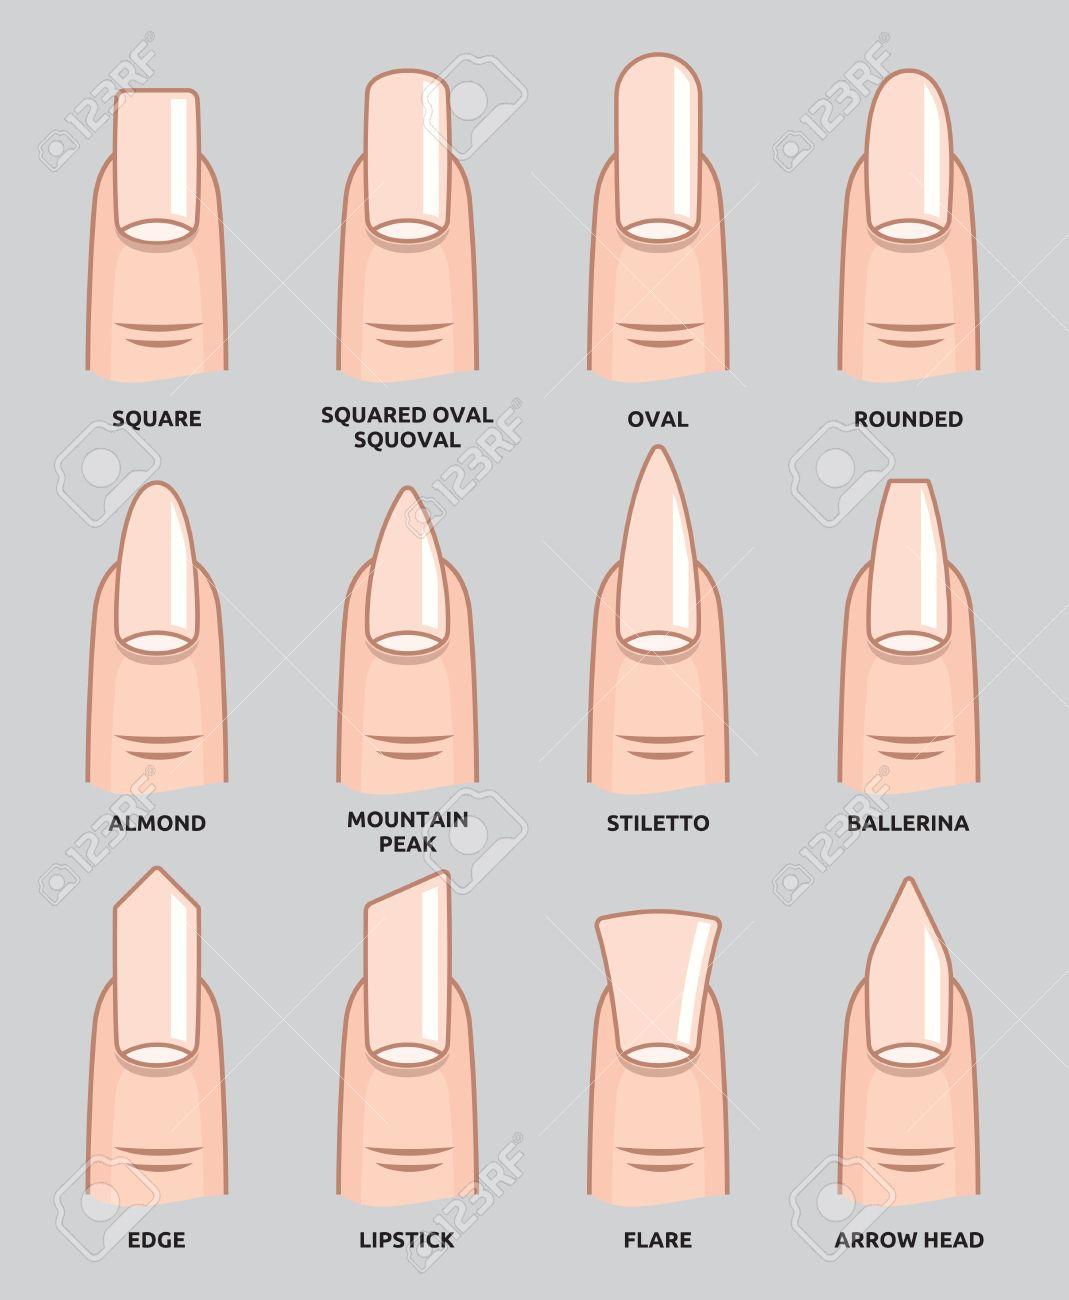 verschiedene nagelformen - fingernägel mode trends lizenzfrei